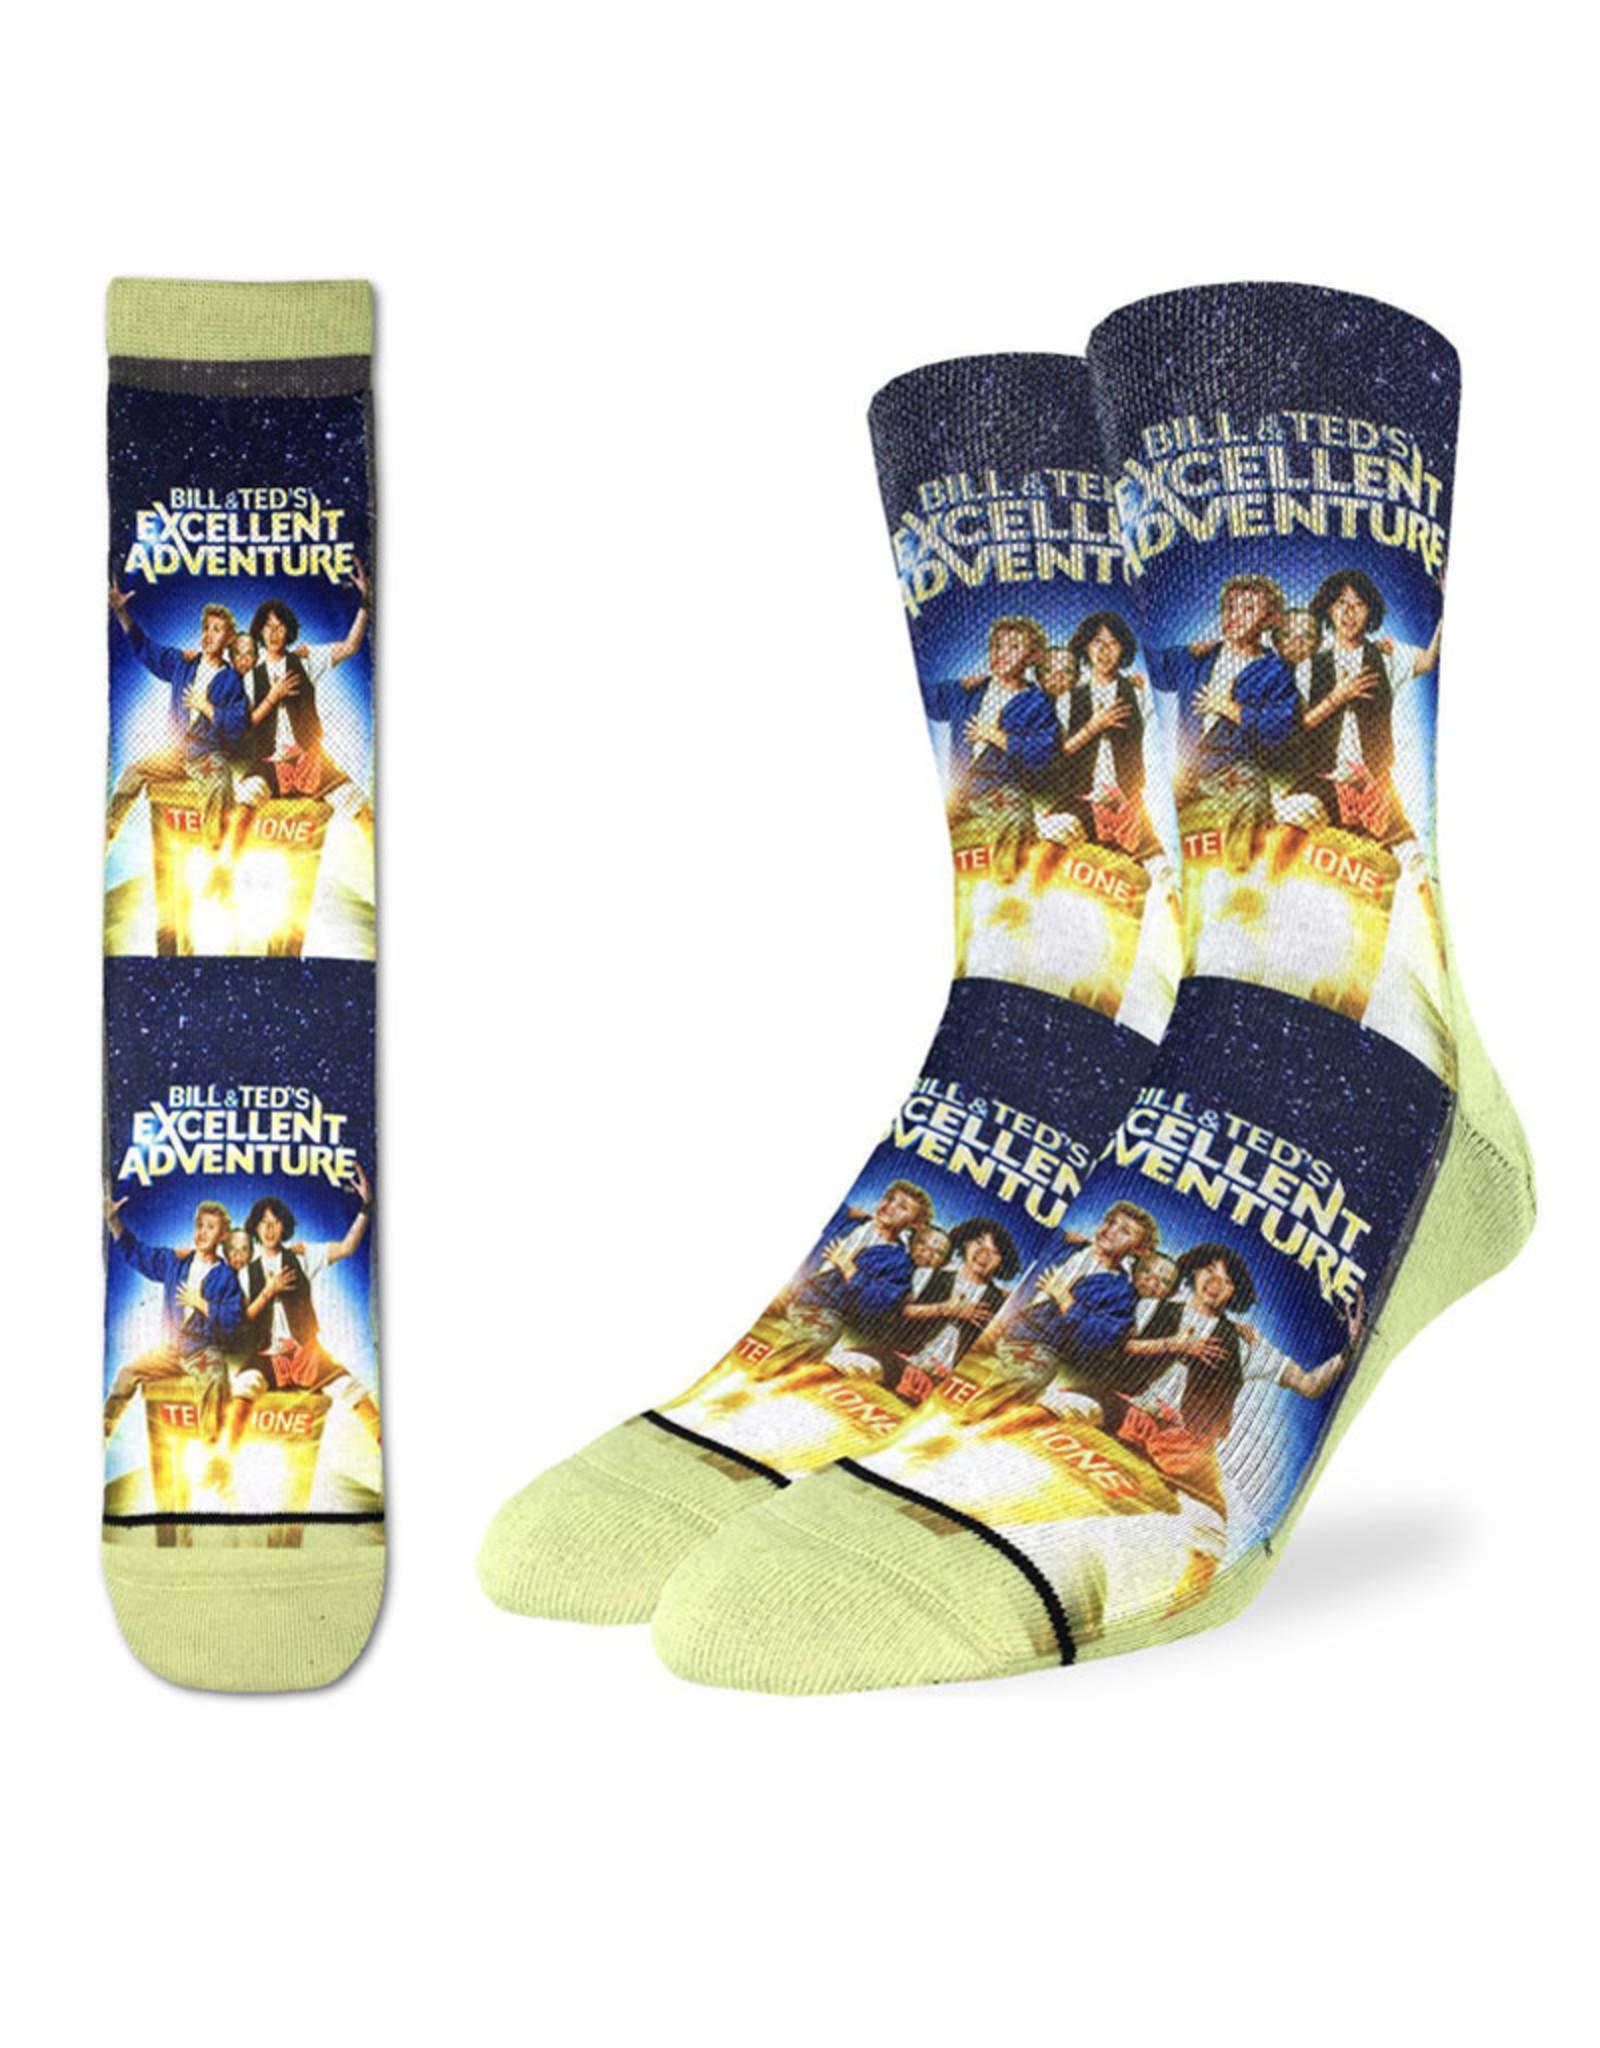 Bill & Ted's Excellent Adventure ( Good Luck Sock Socks )